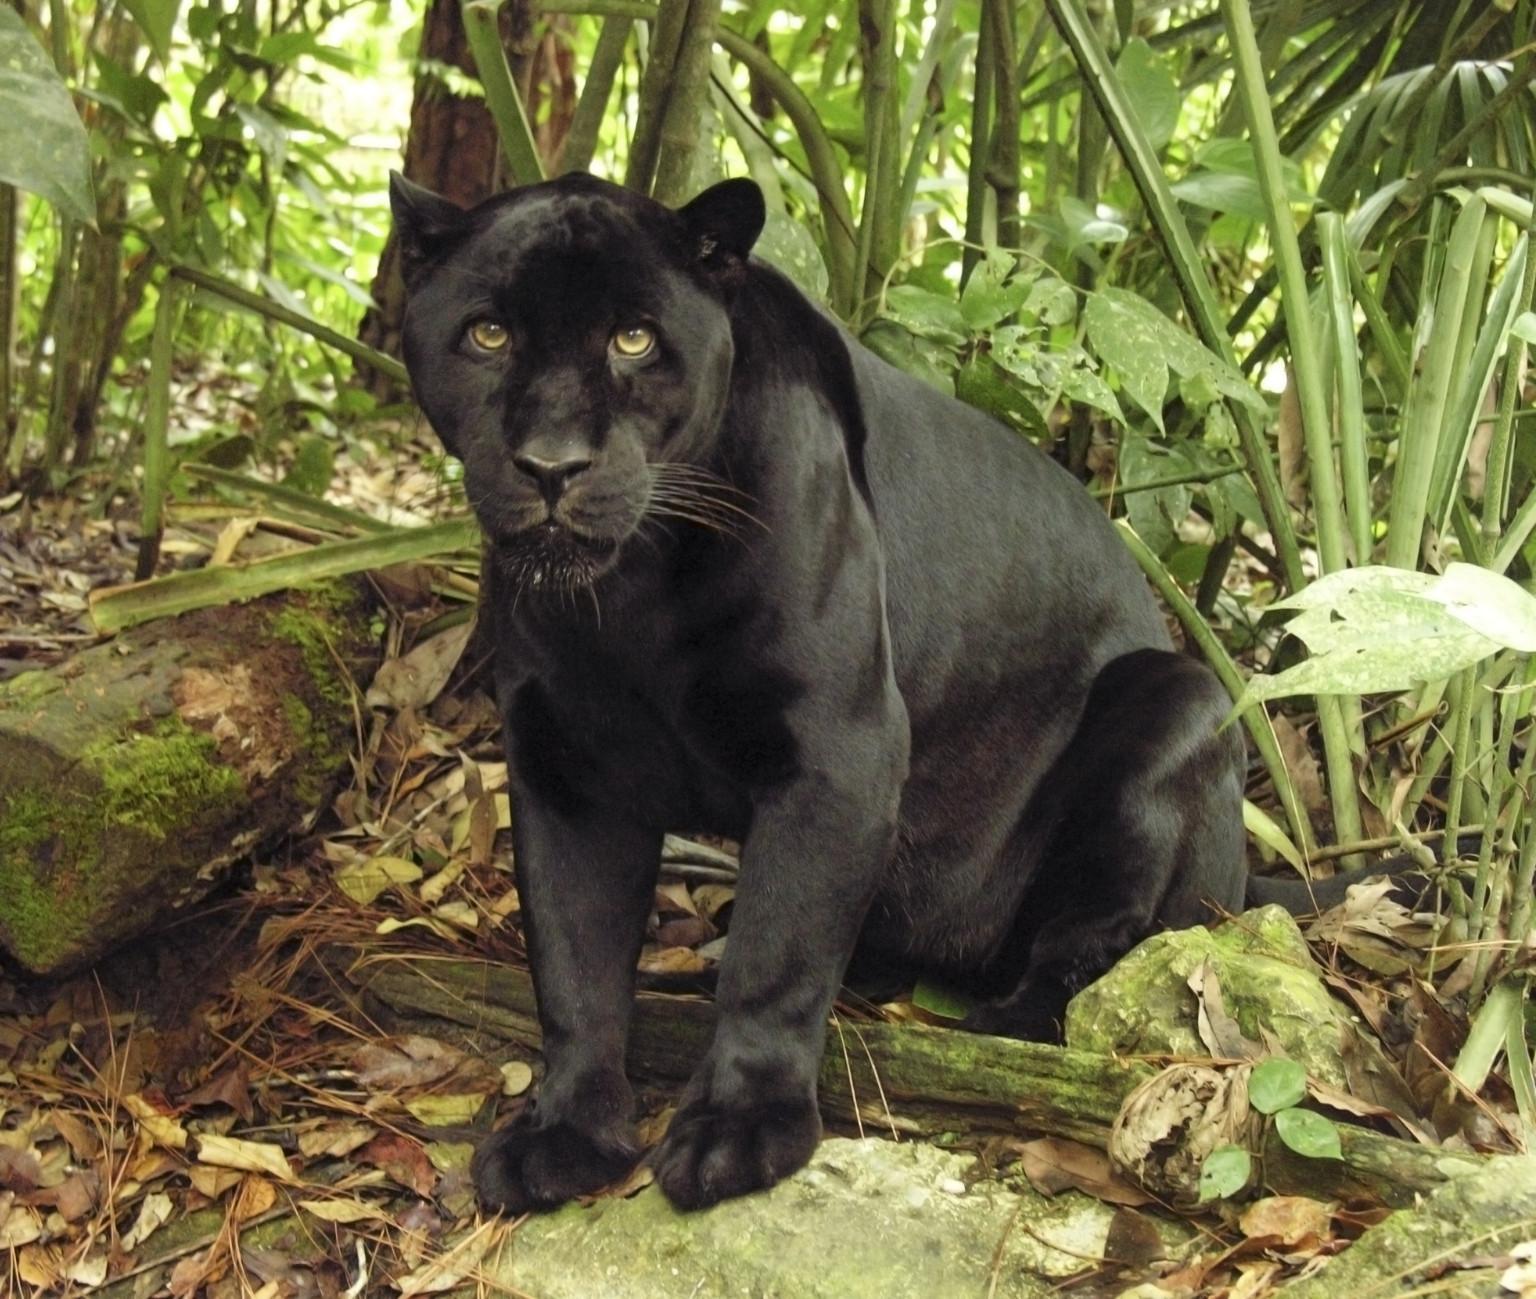 Jungle Book: Look for the Bare Necessities | Cara Joy David